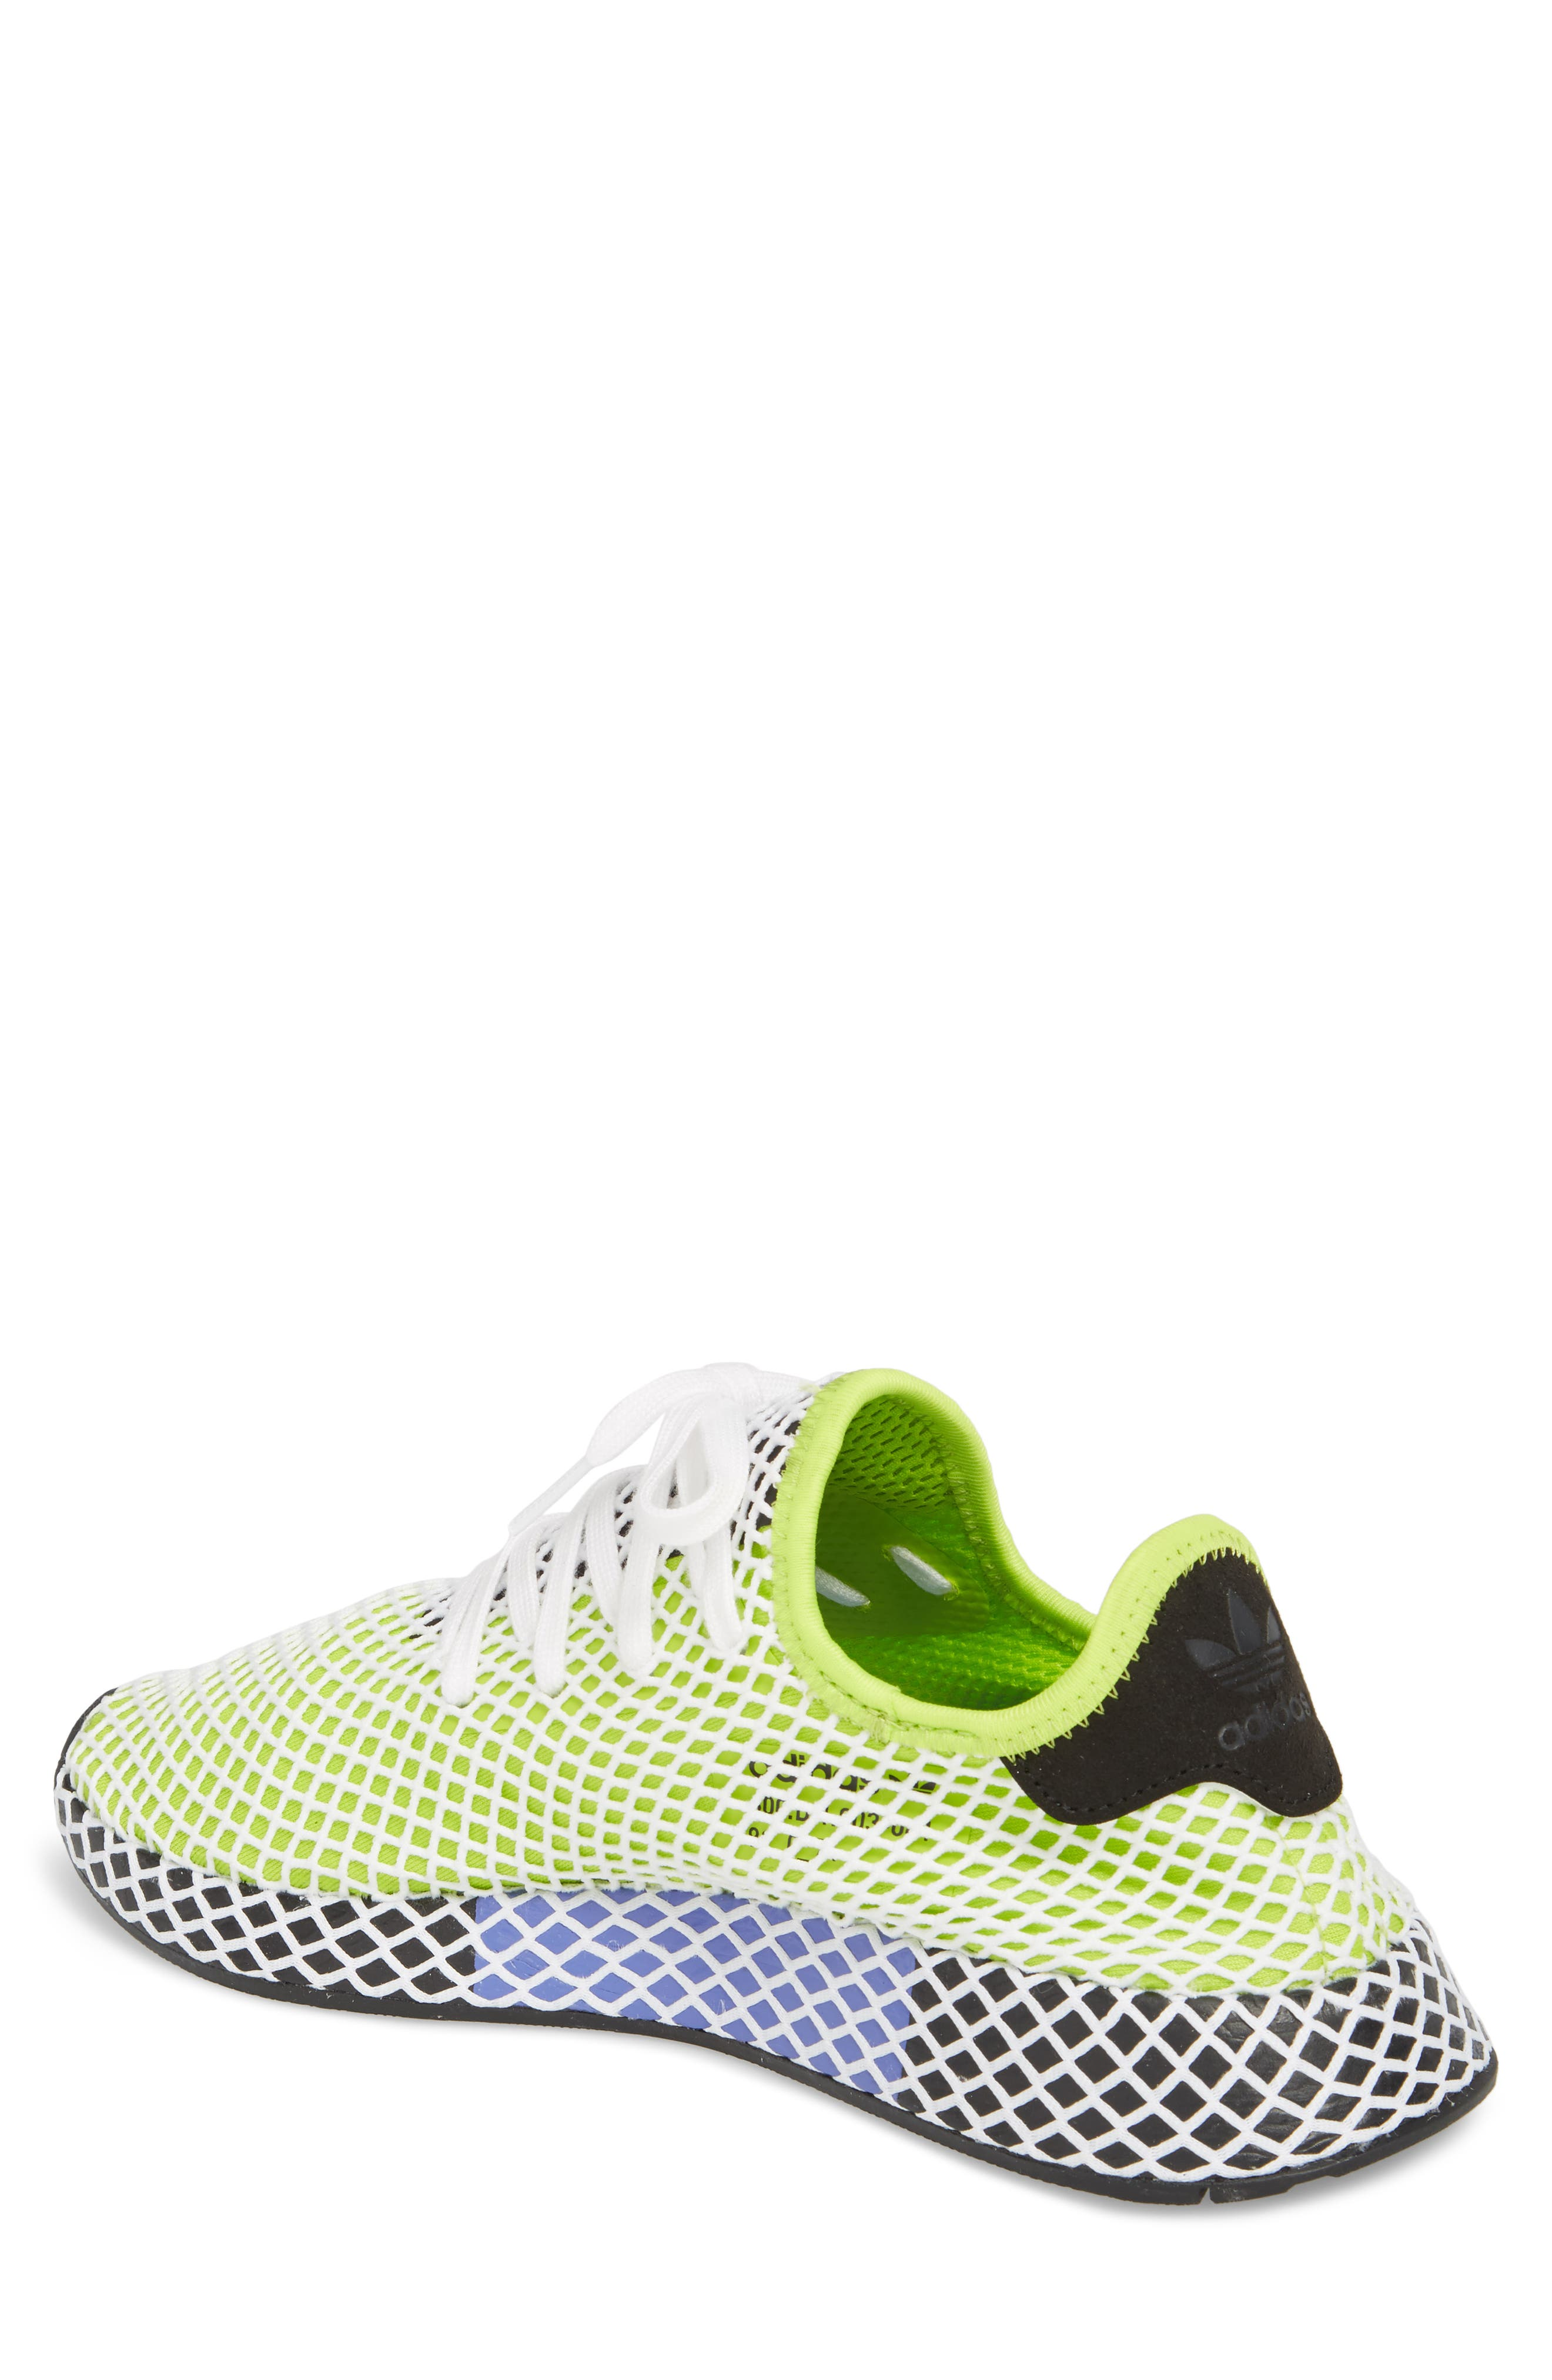 Deerupt Runner Sneaker,                             Alternate thumbnail 22, color,